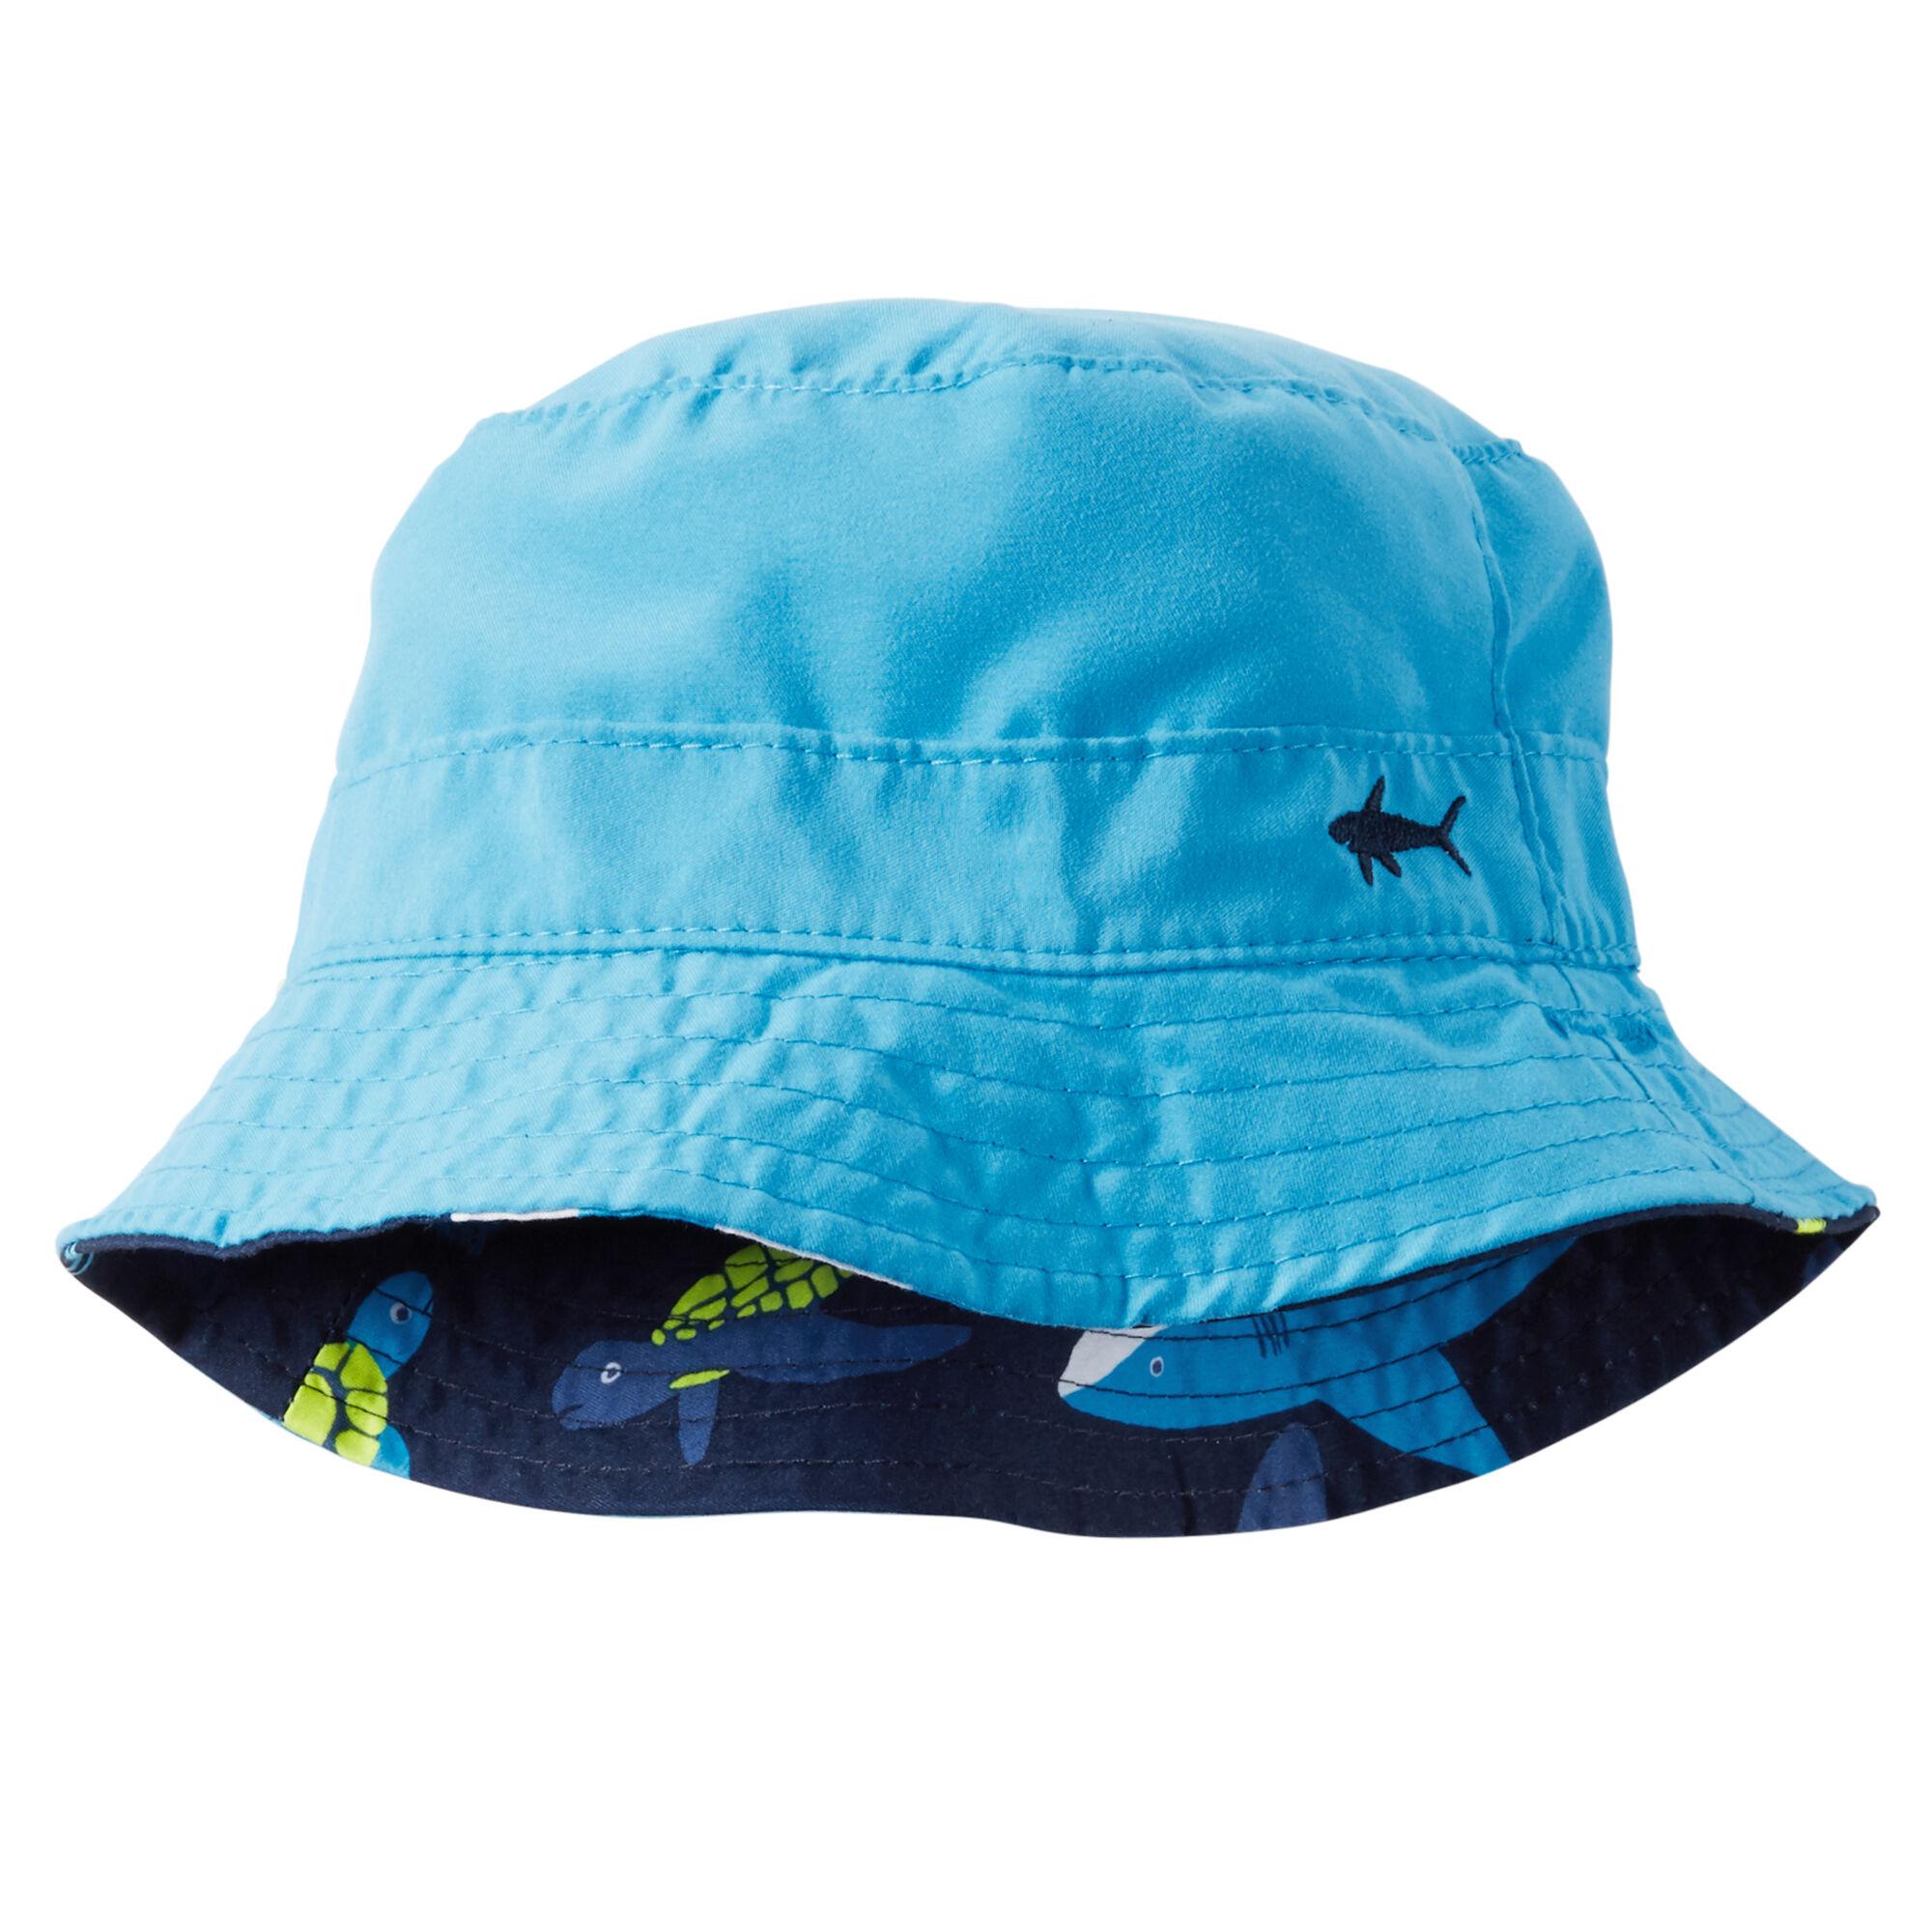 Boys Bucket Hat - Hat HD Image Ukjugs.Org 4afdf49cb88